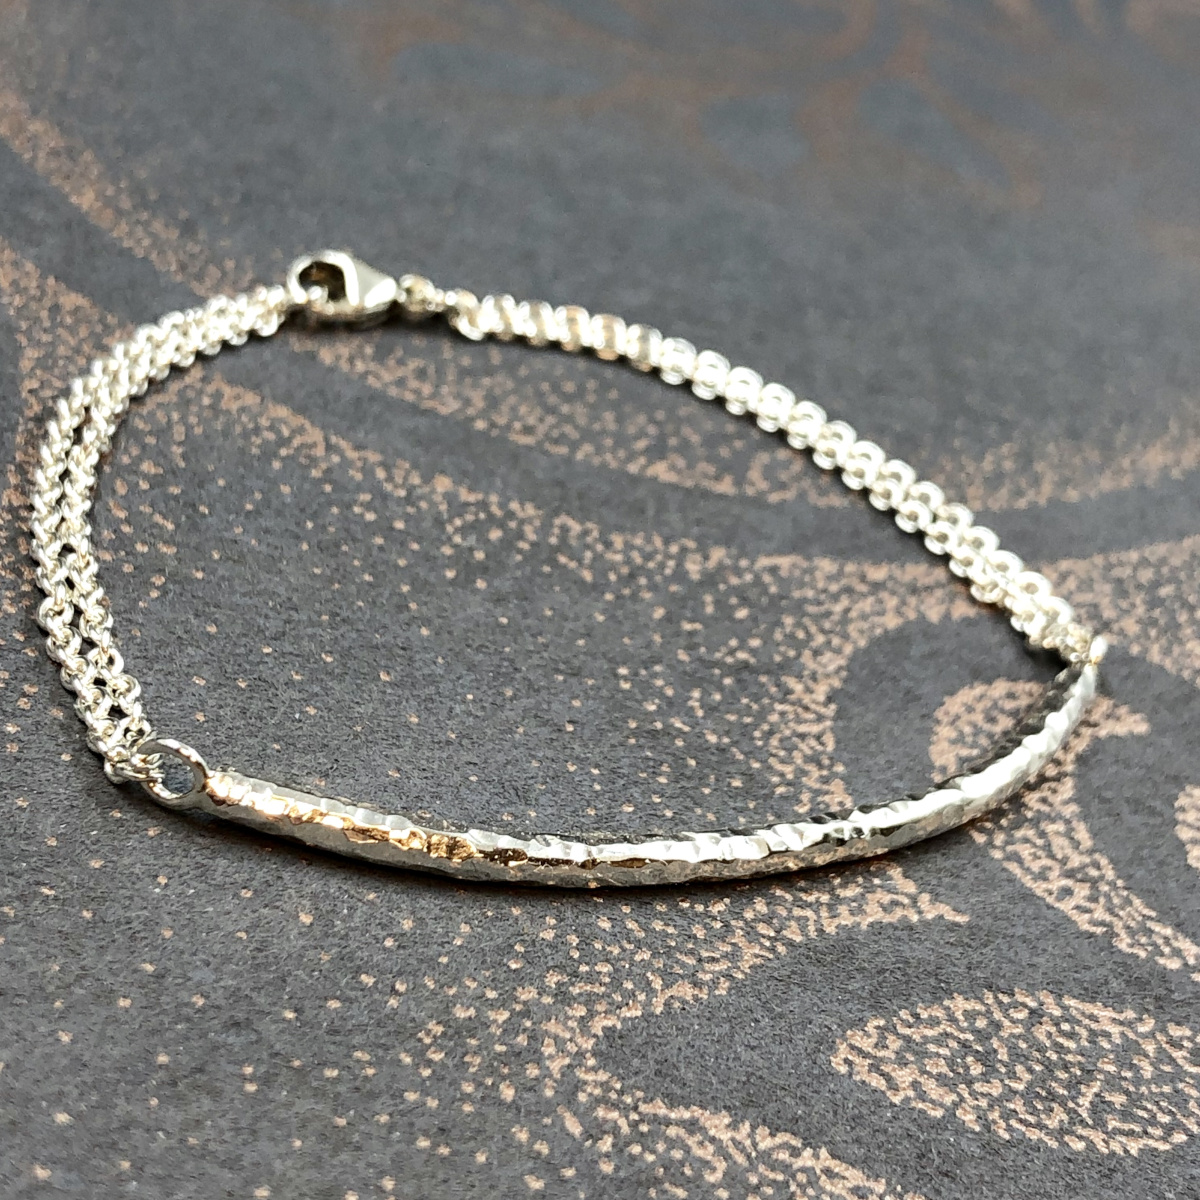 Silverarmband, armband i silver, handgjort